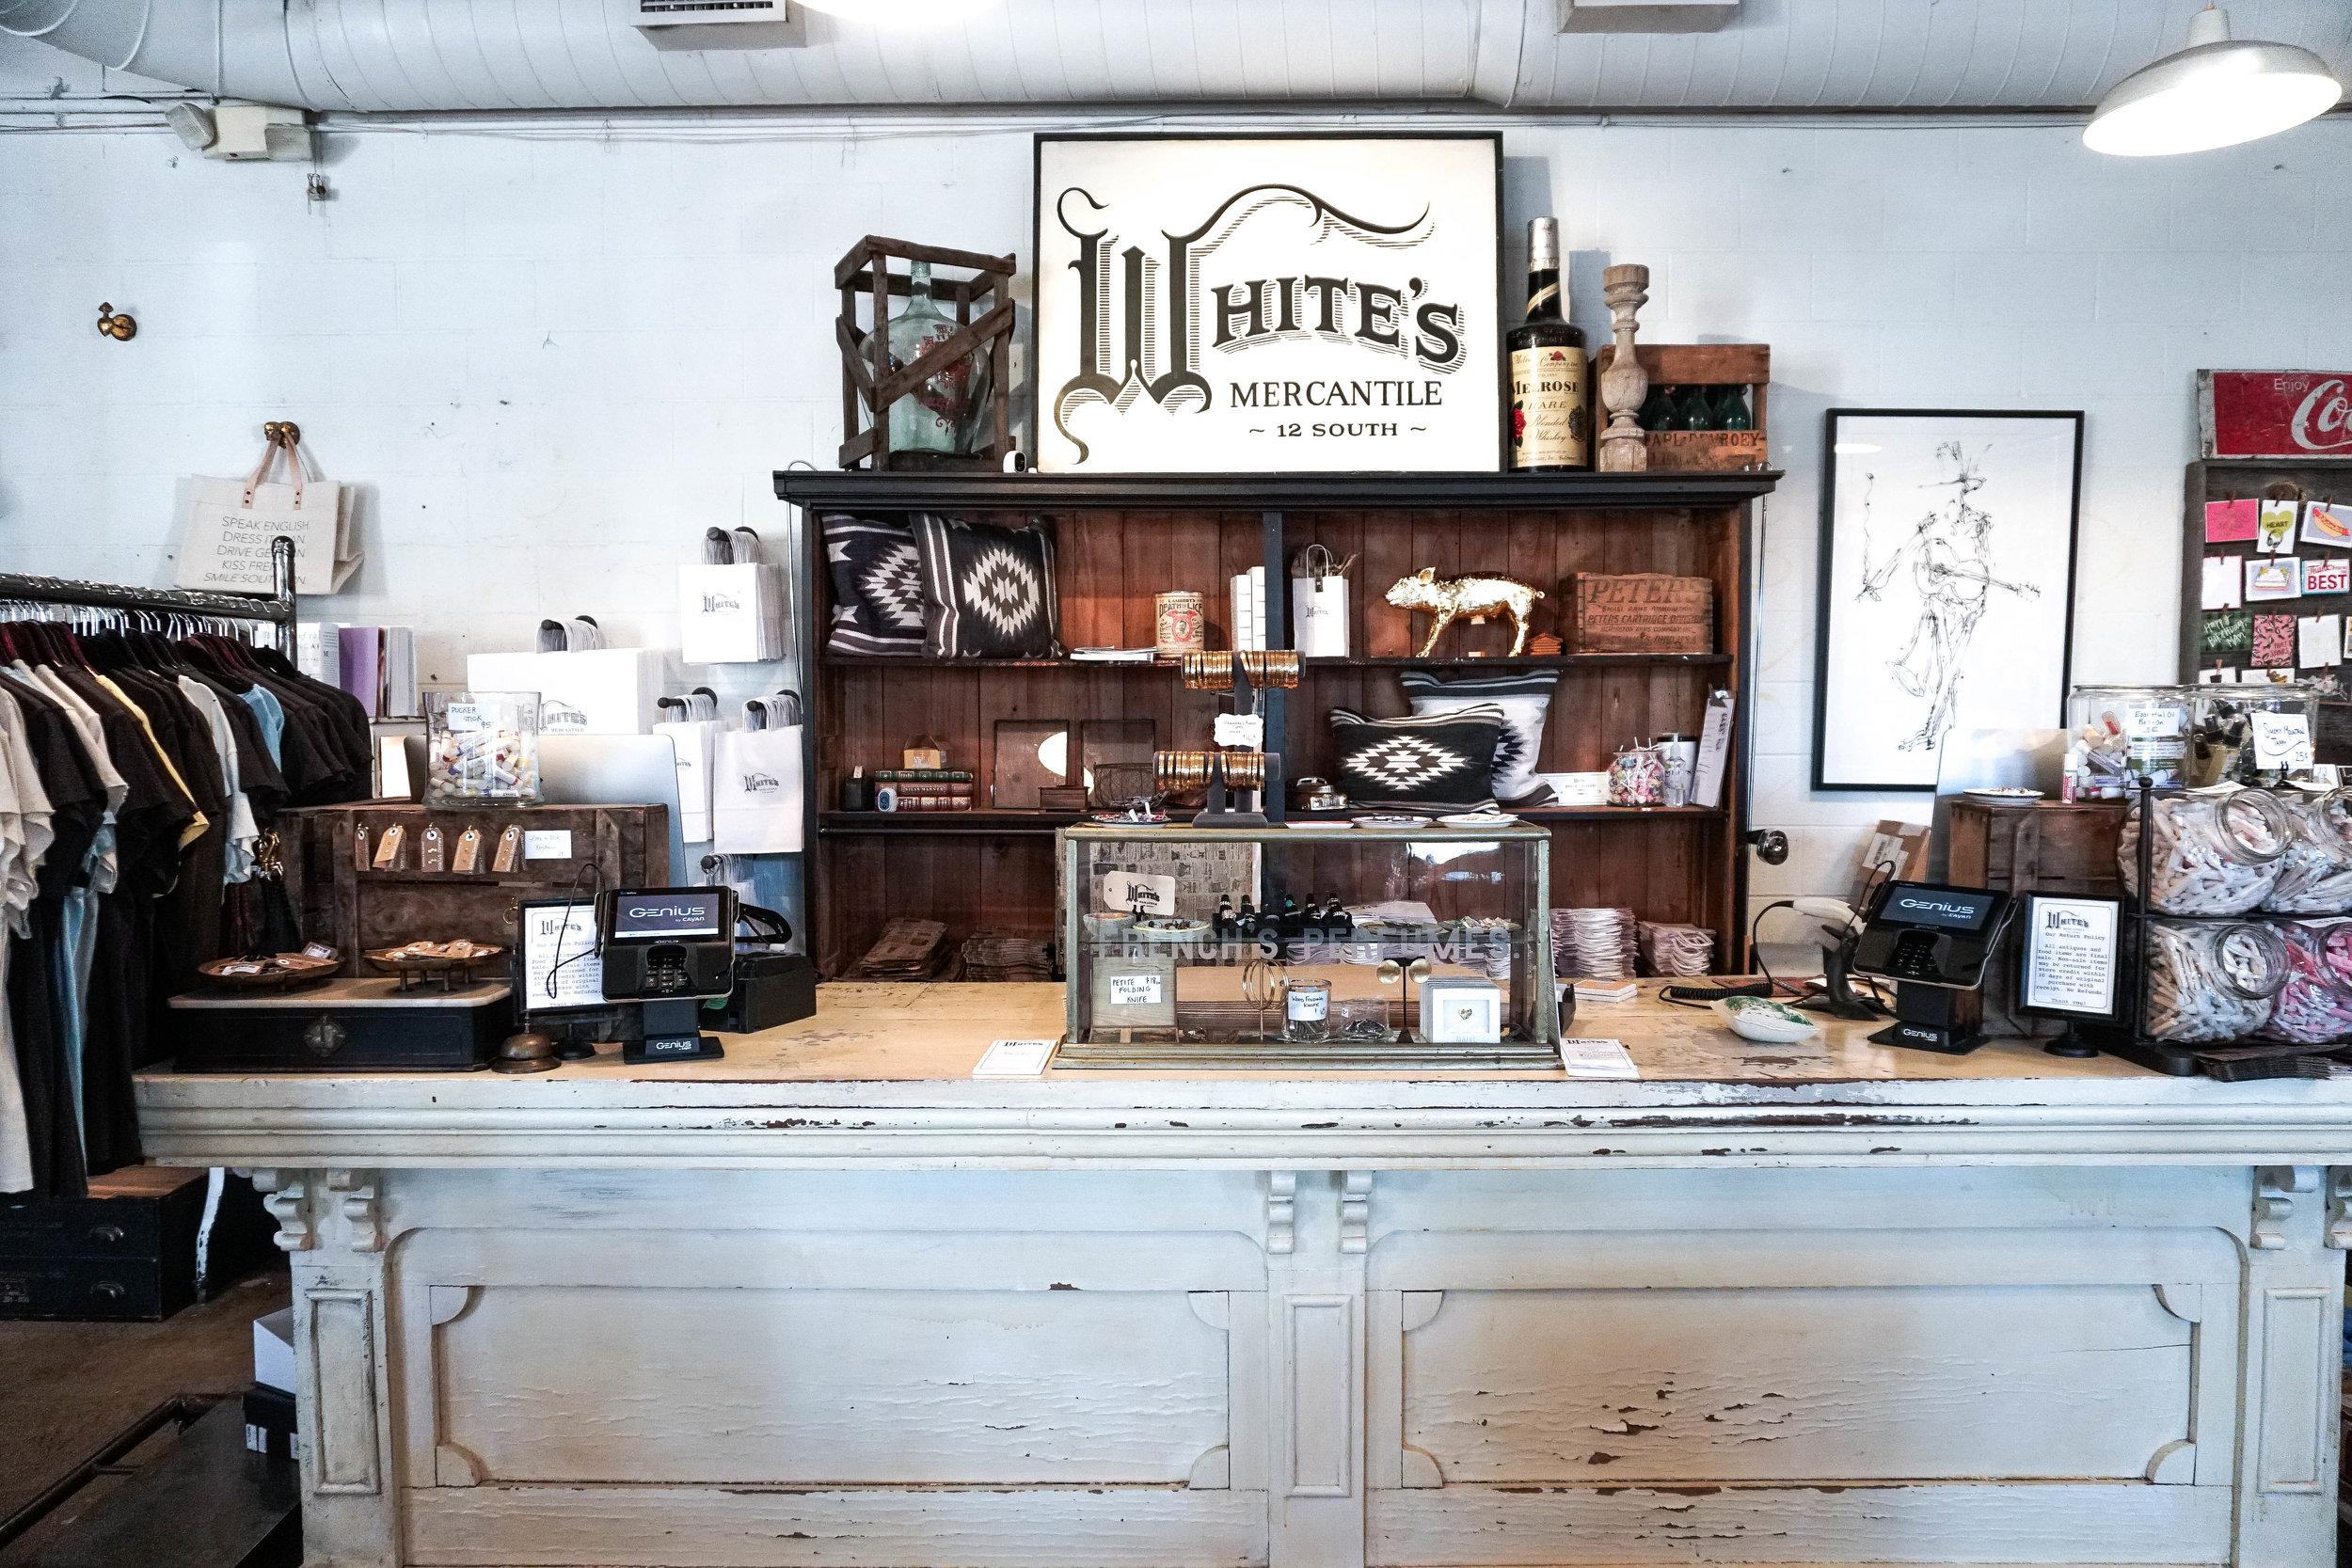 where-to-shop-nashville-whites-merchantile-12-south-modern-general-store.jpg